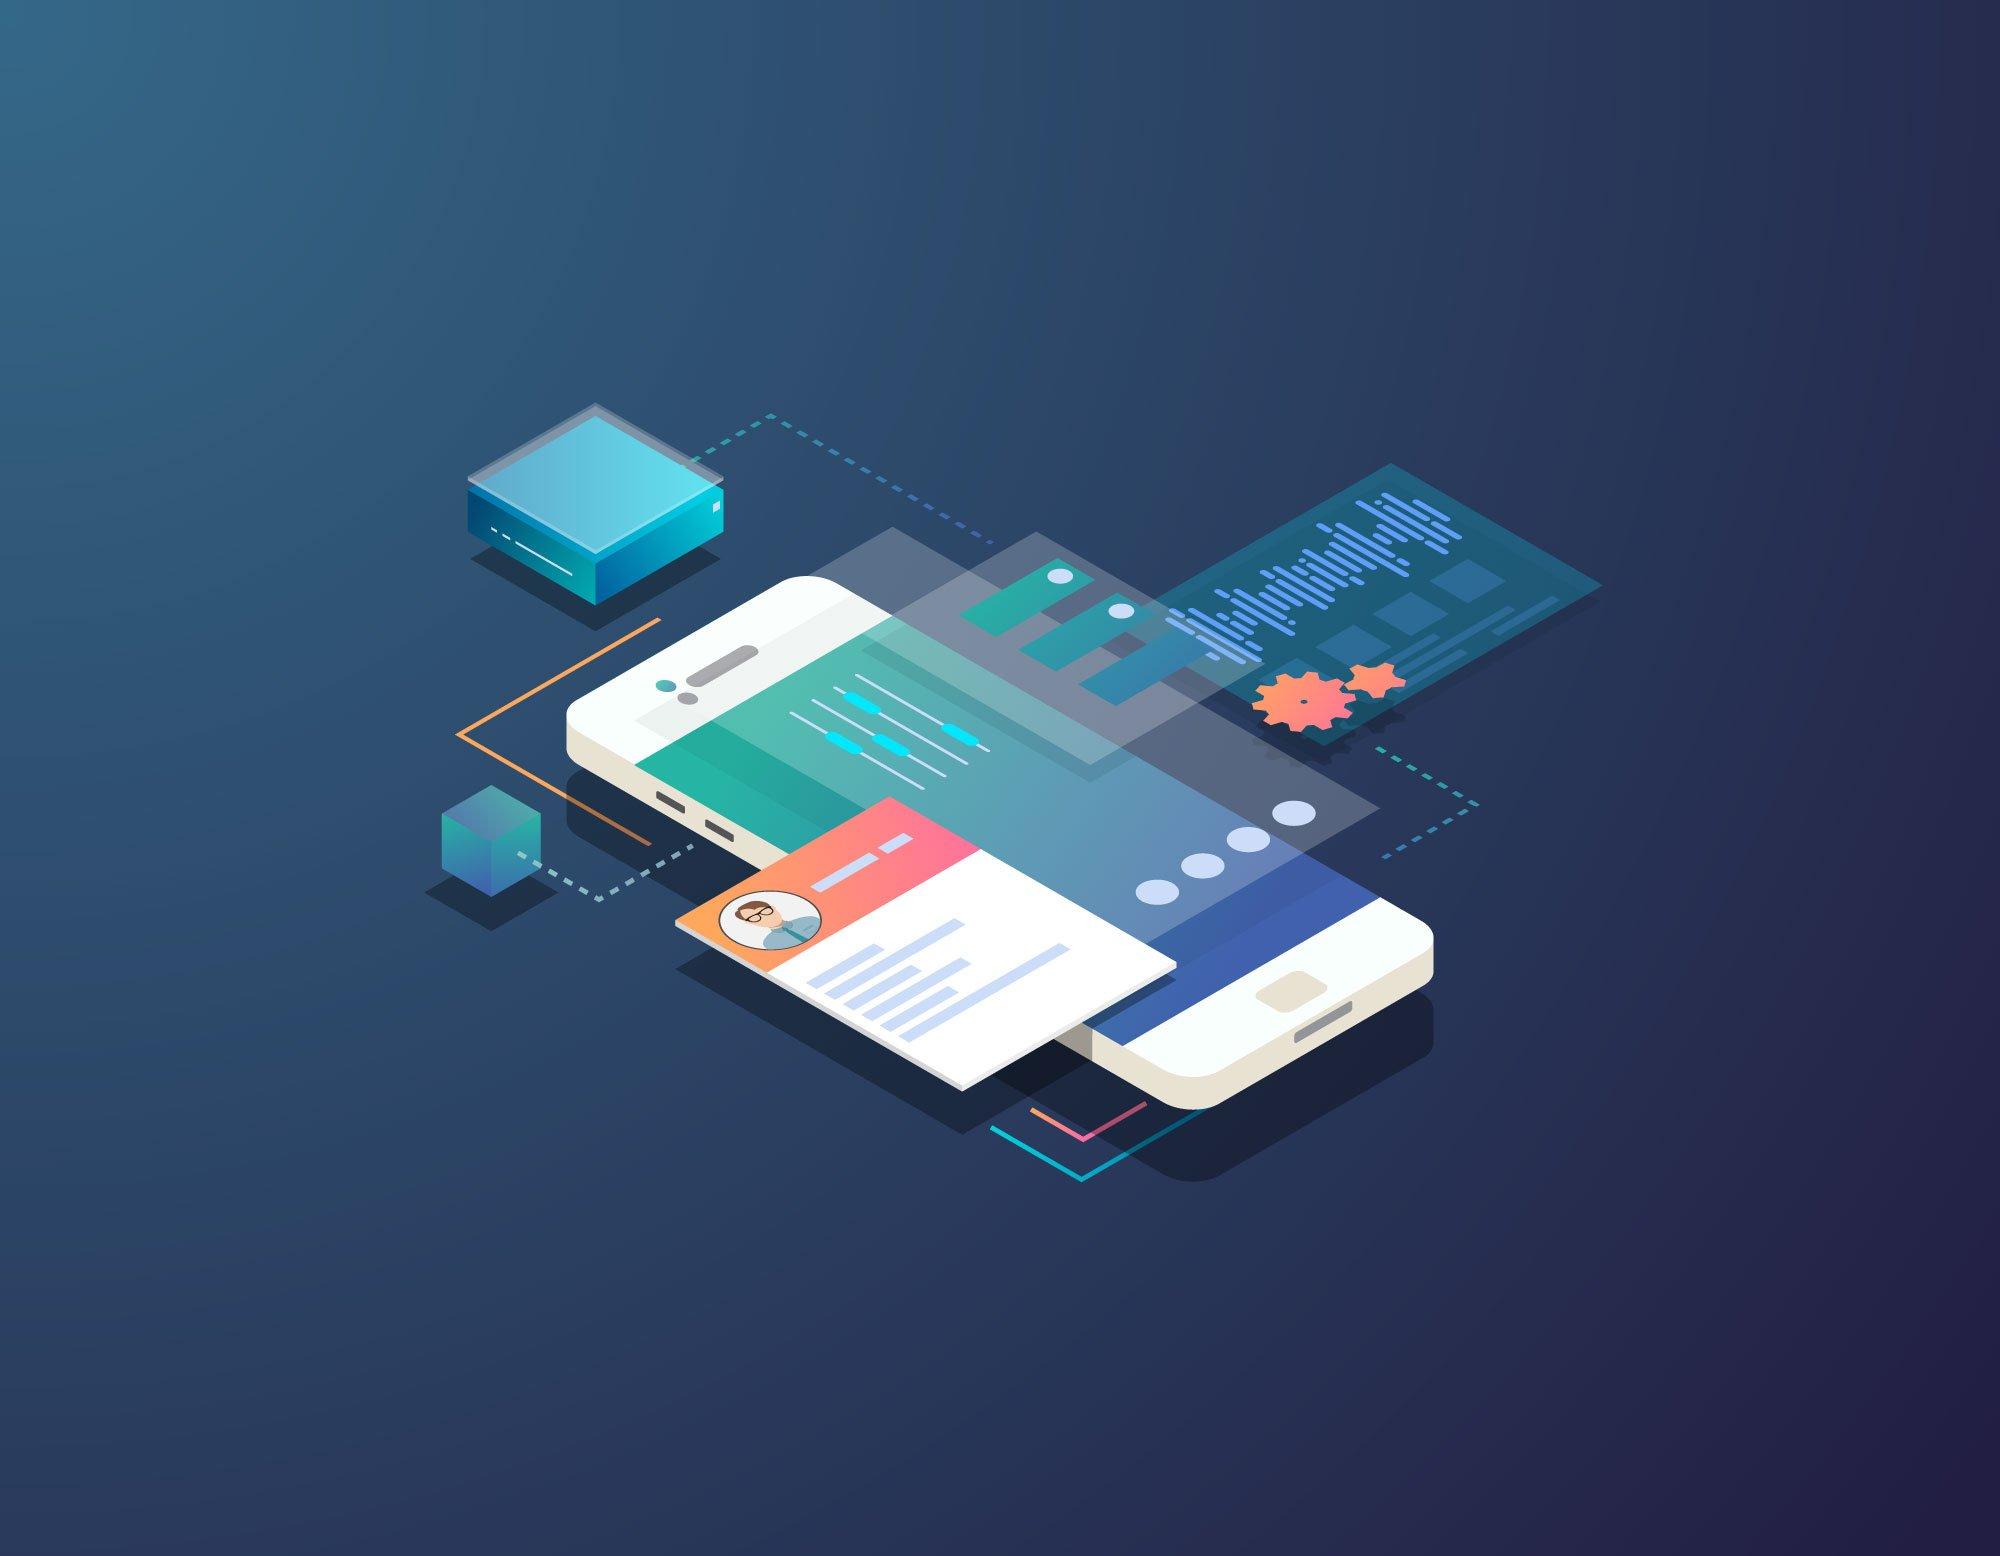 concept-mobile-phone-ux-ui-design-integration